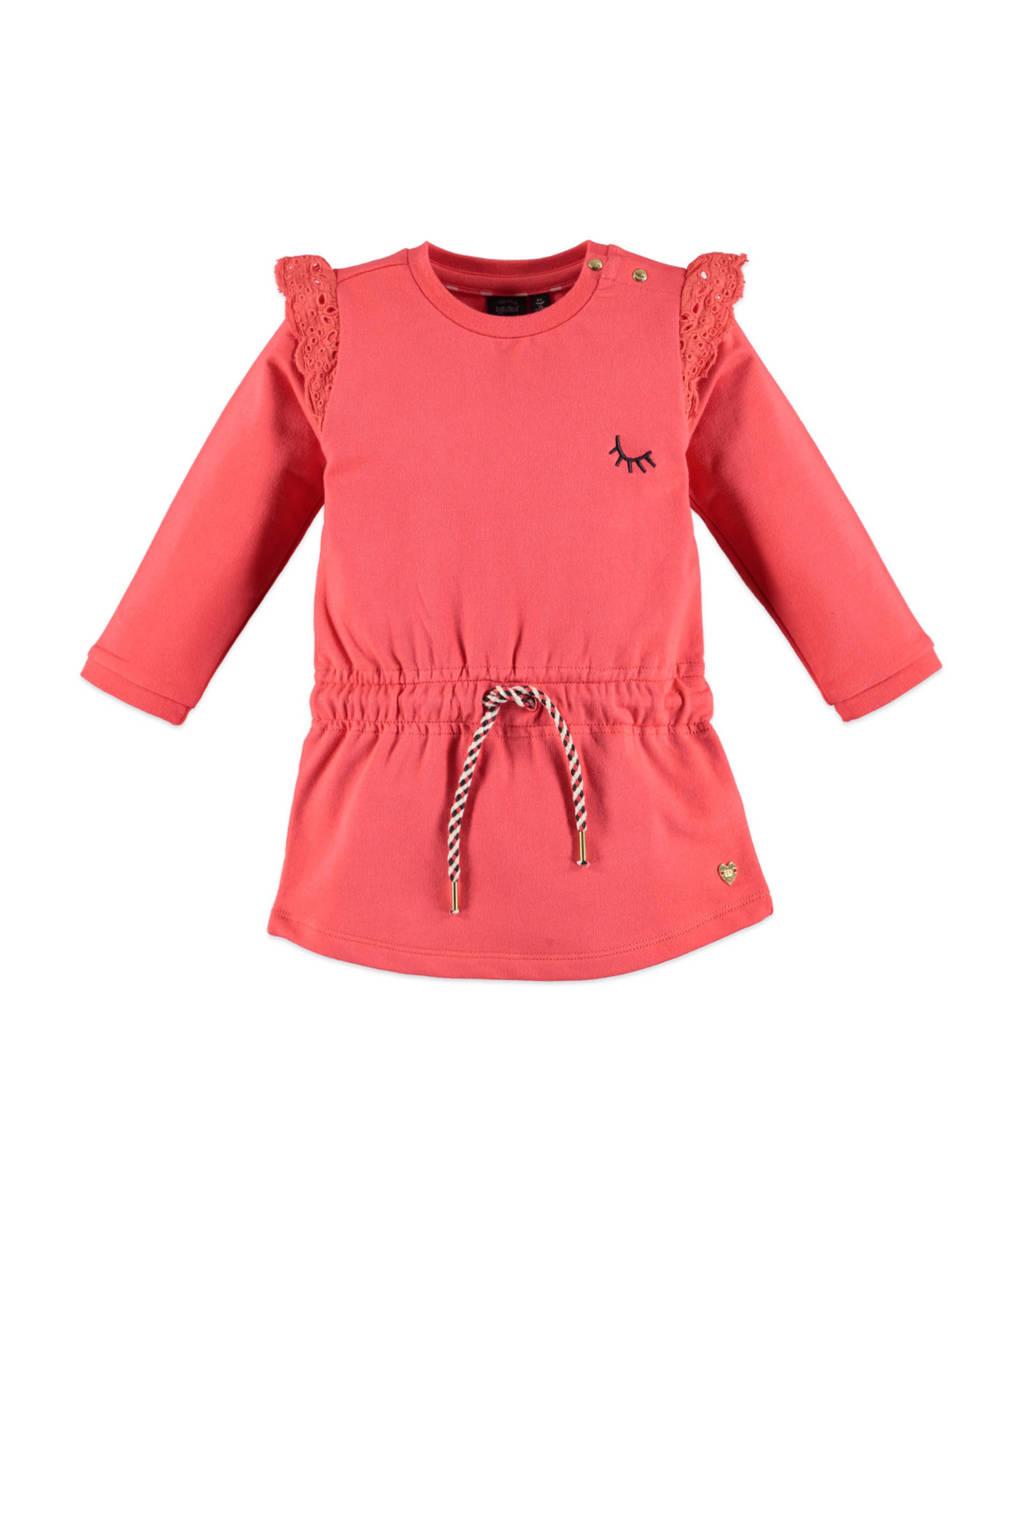 Babyface fleece jersey jurk met ruches roze, Roze